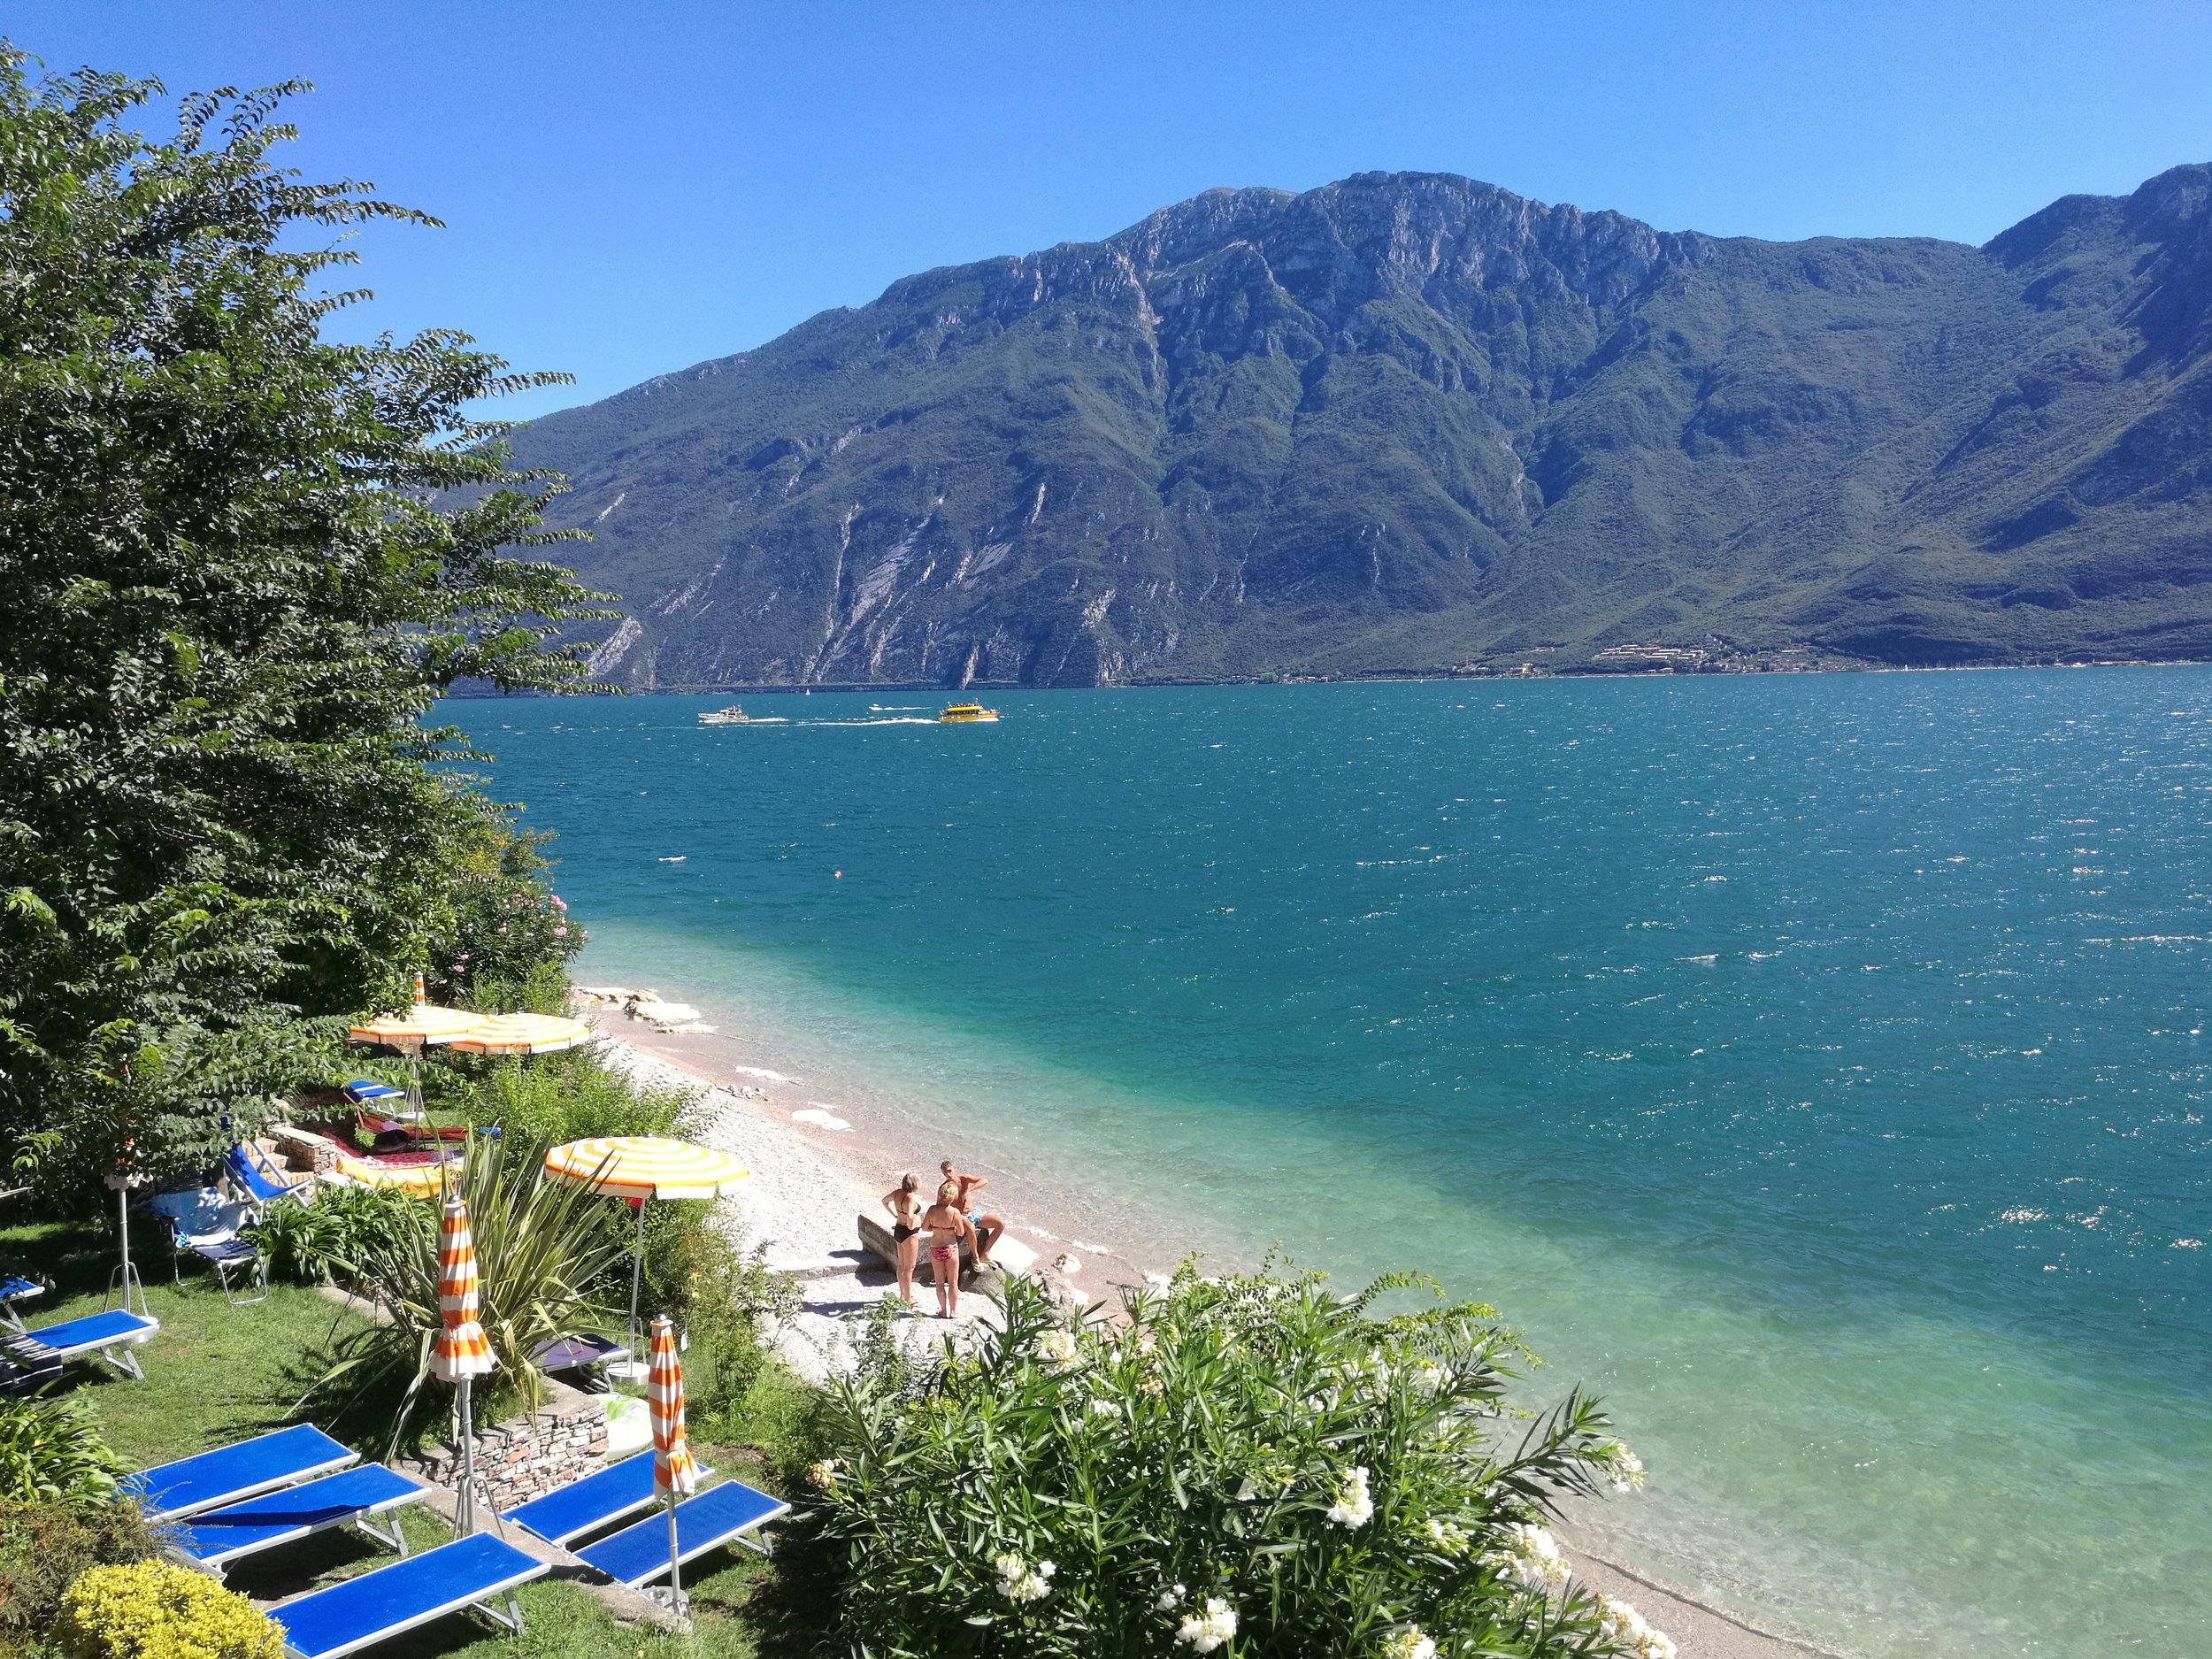 hotel_lido_spiaggia001.jpg